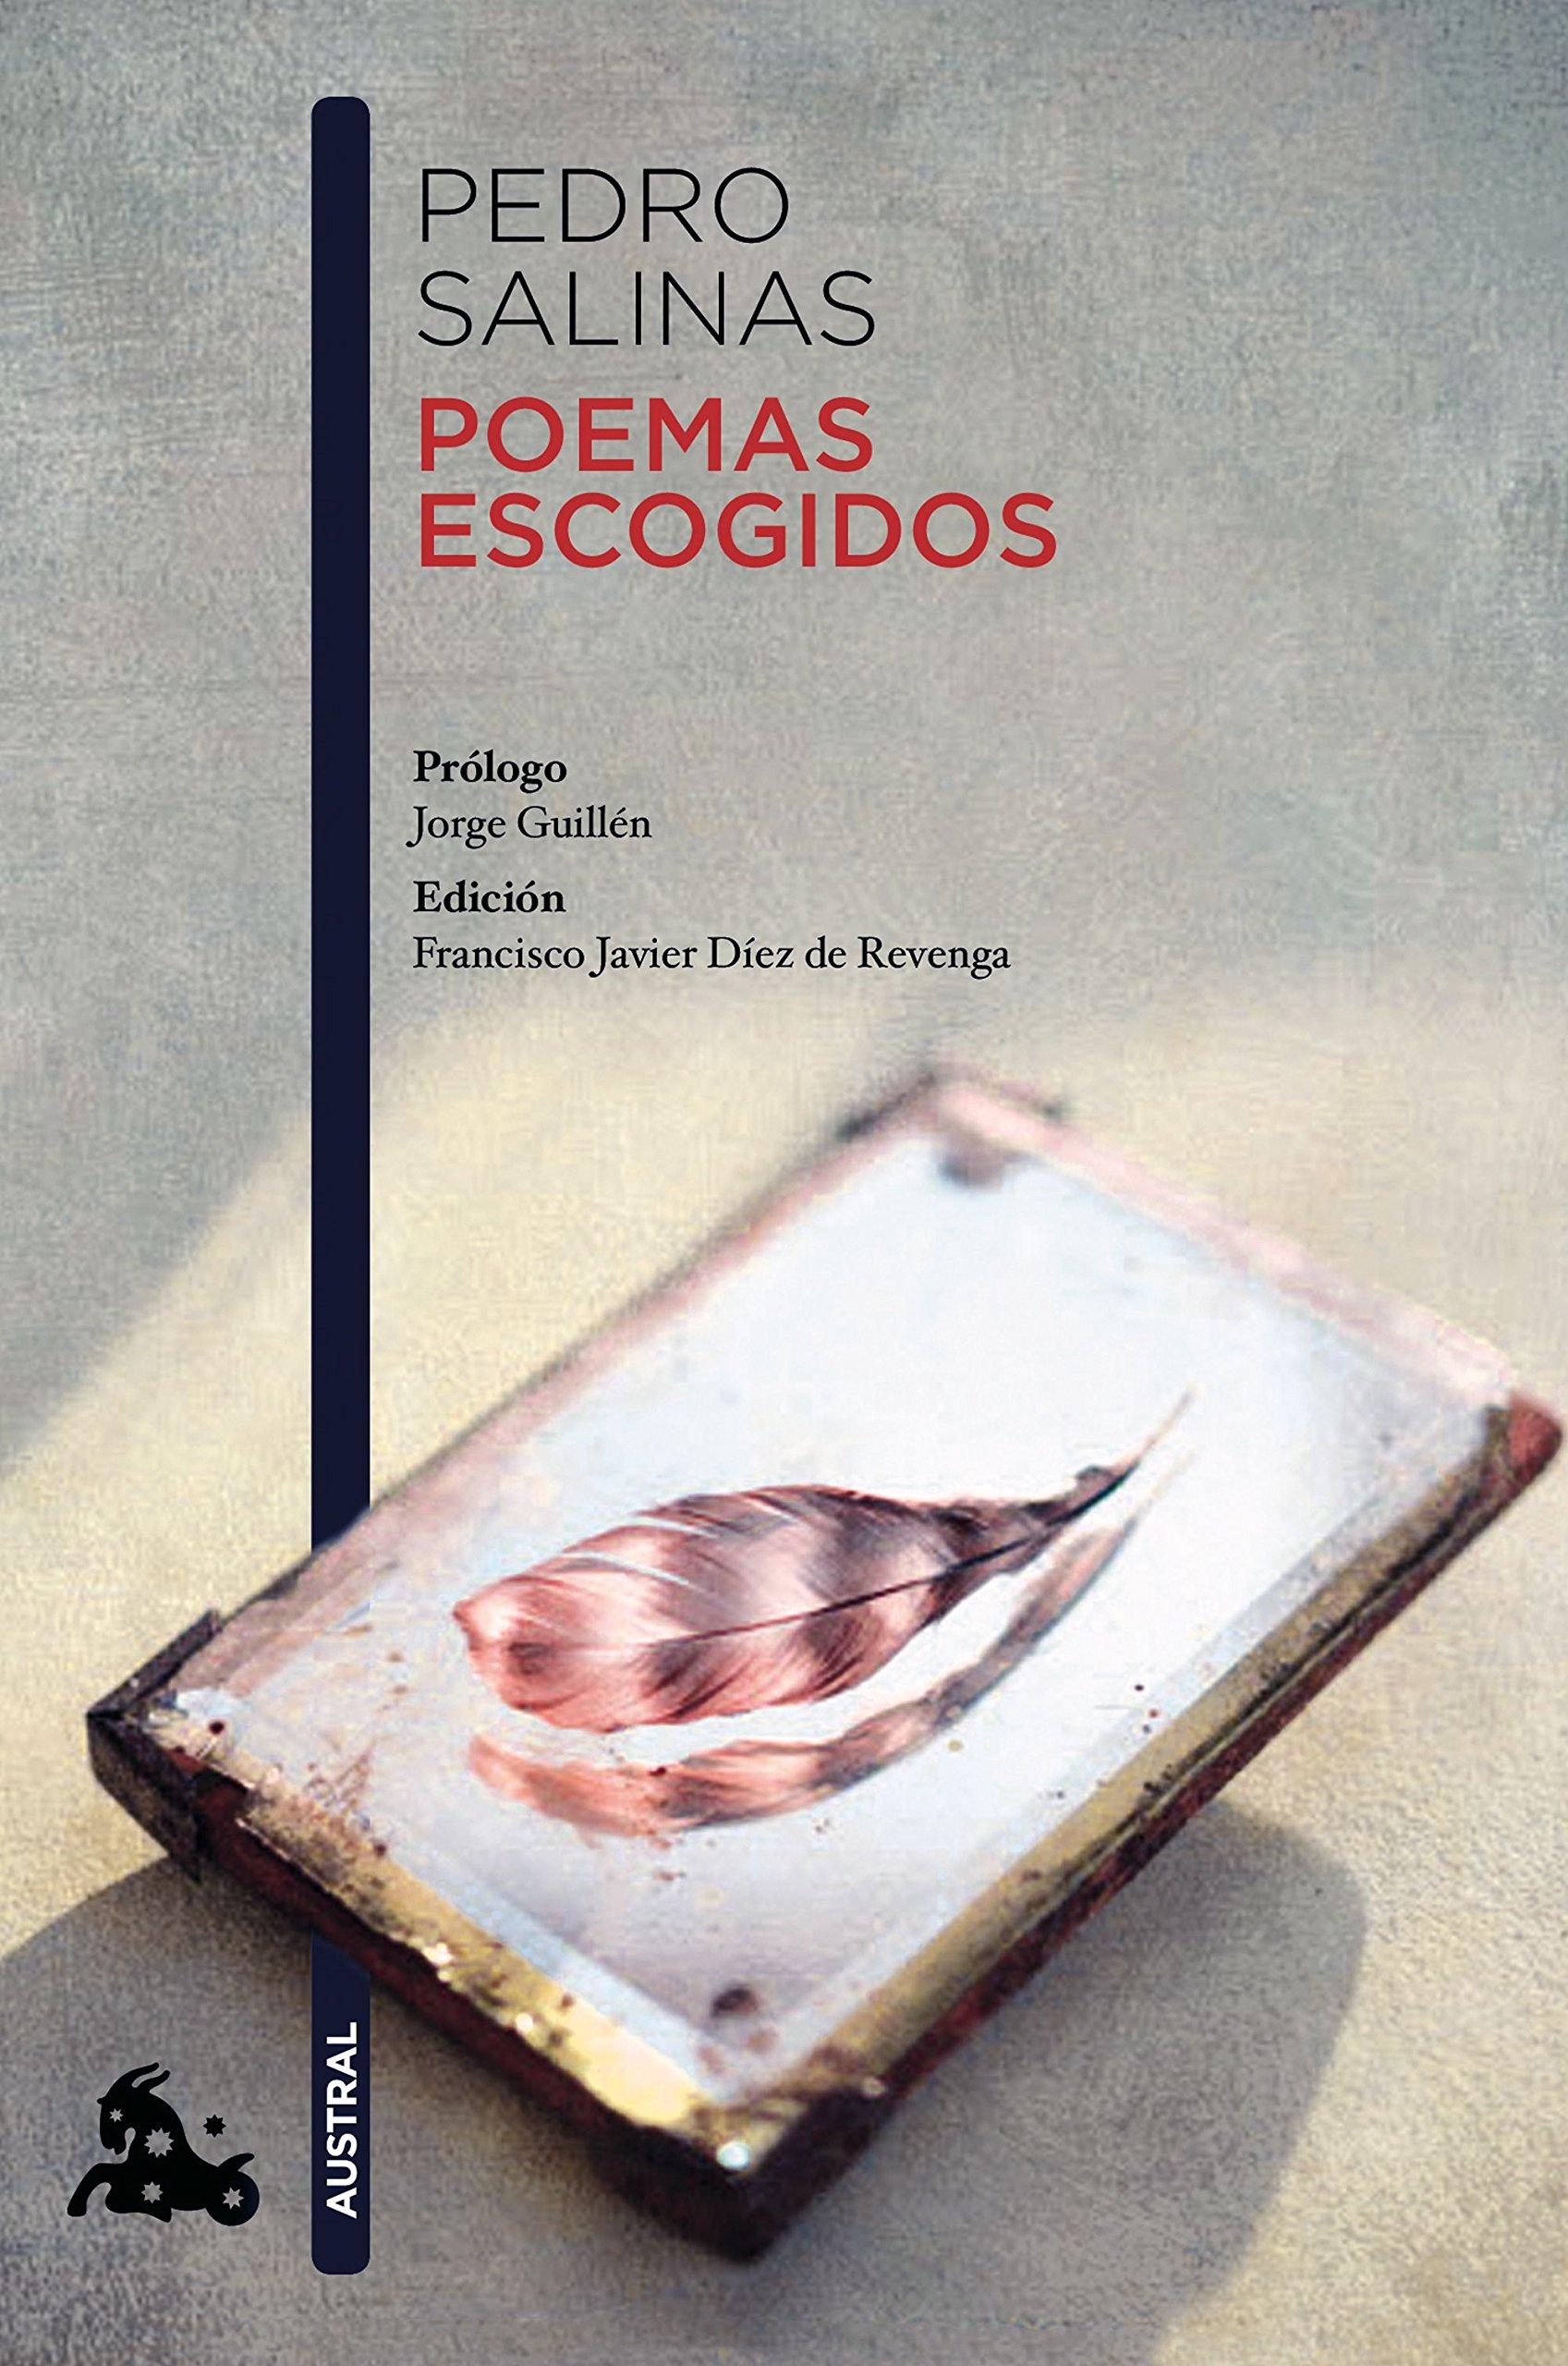 Poemas de Pedro Salinas